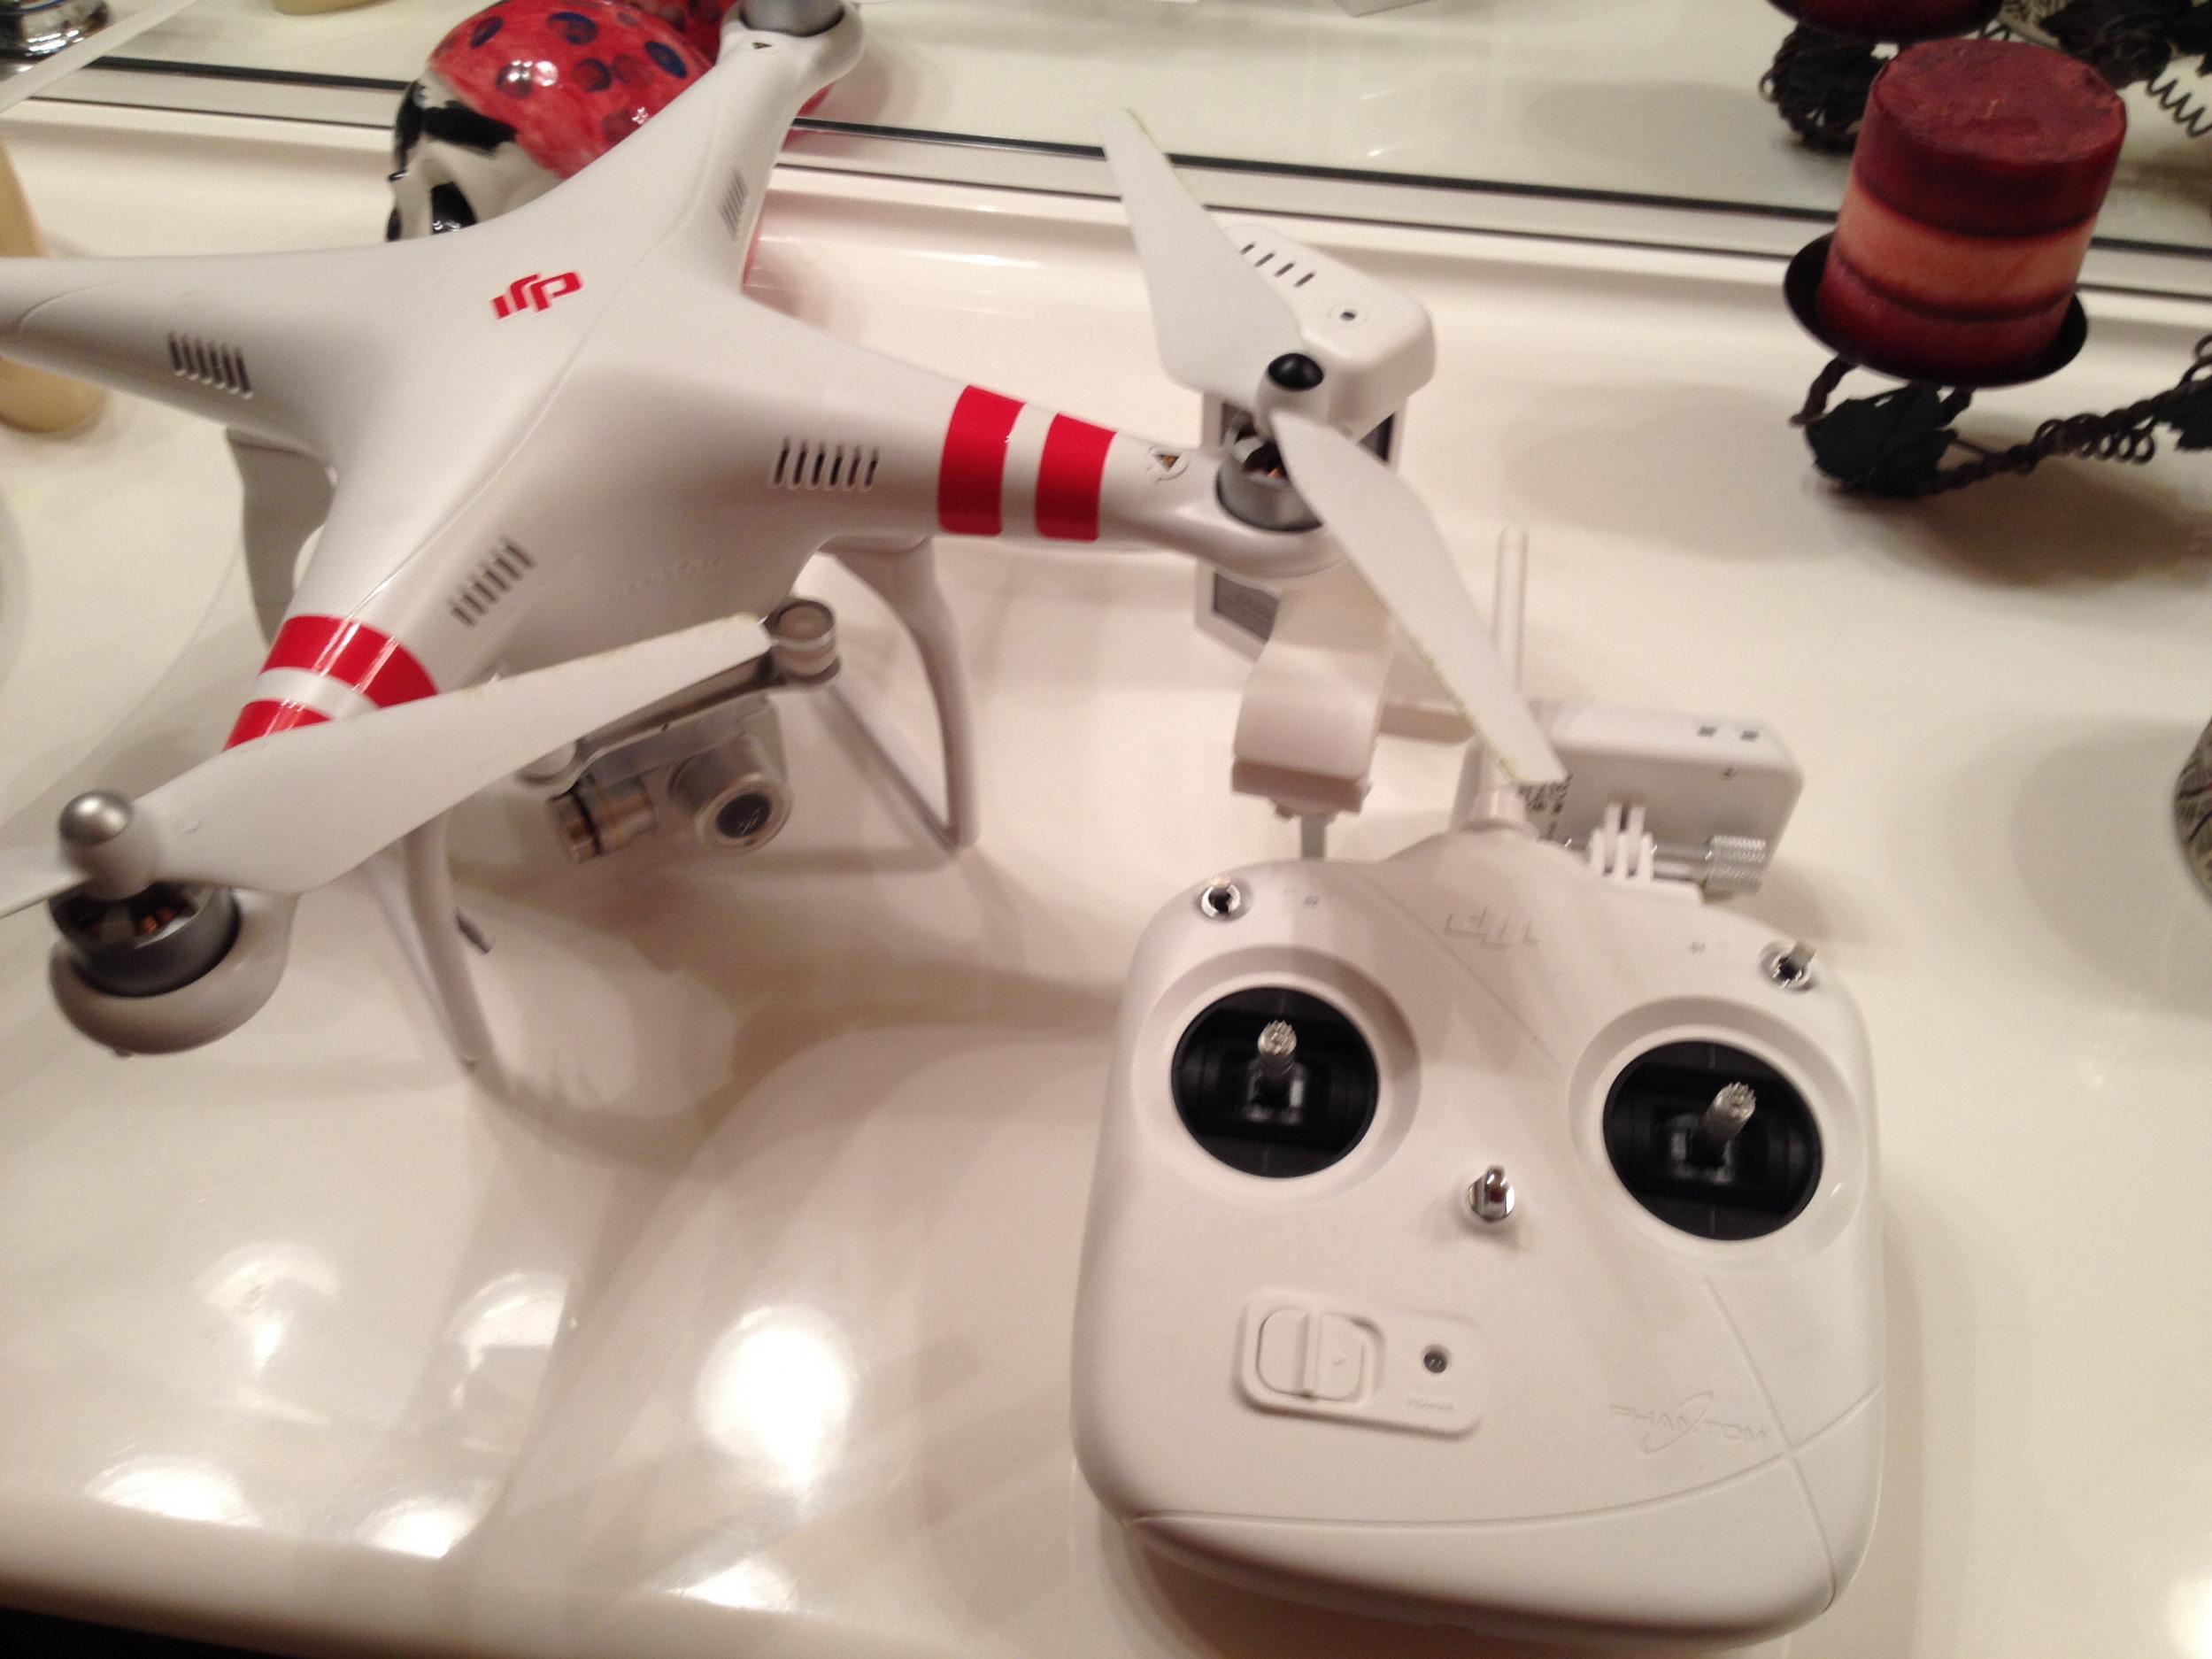 Dji phantom 2 vision plus drone. - R/C Tech Forums